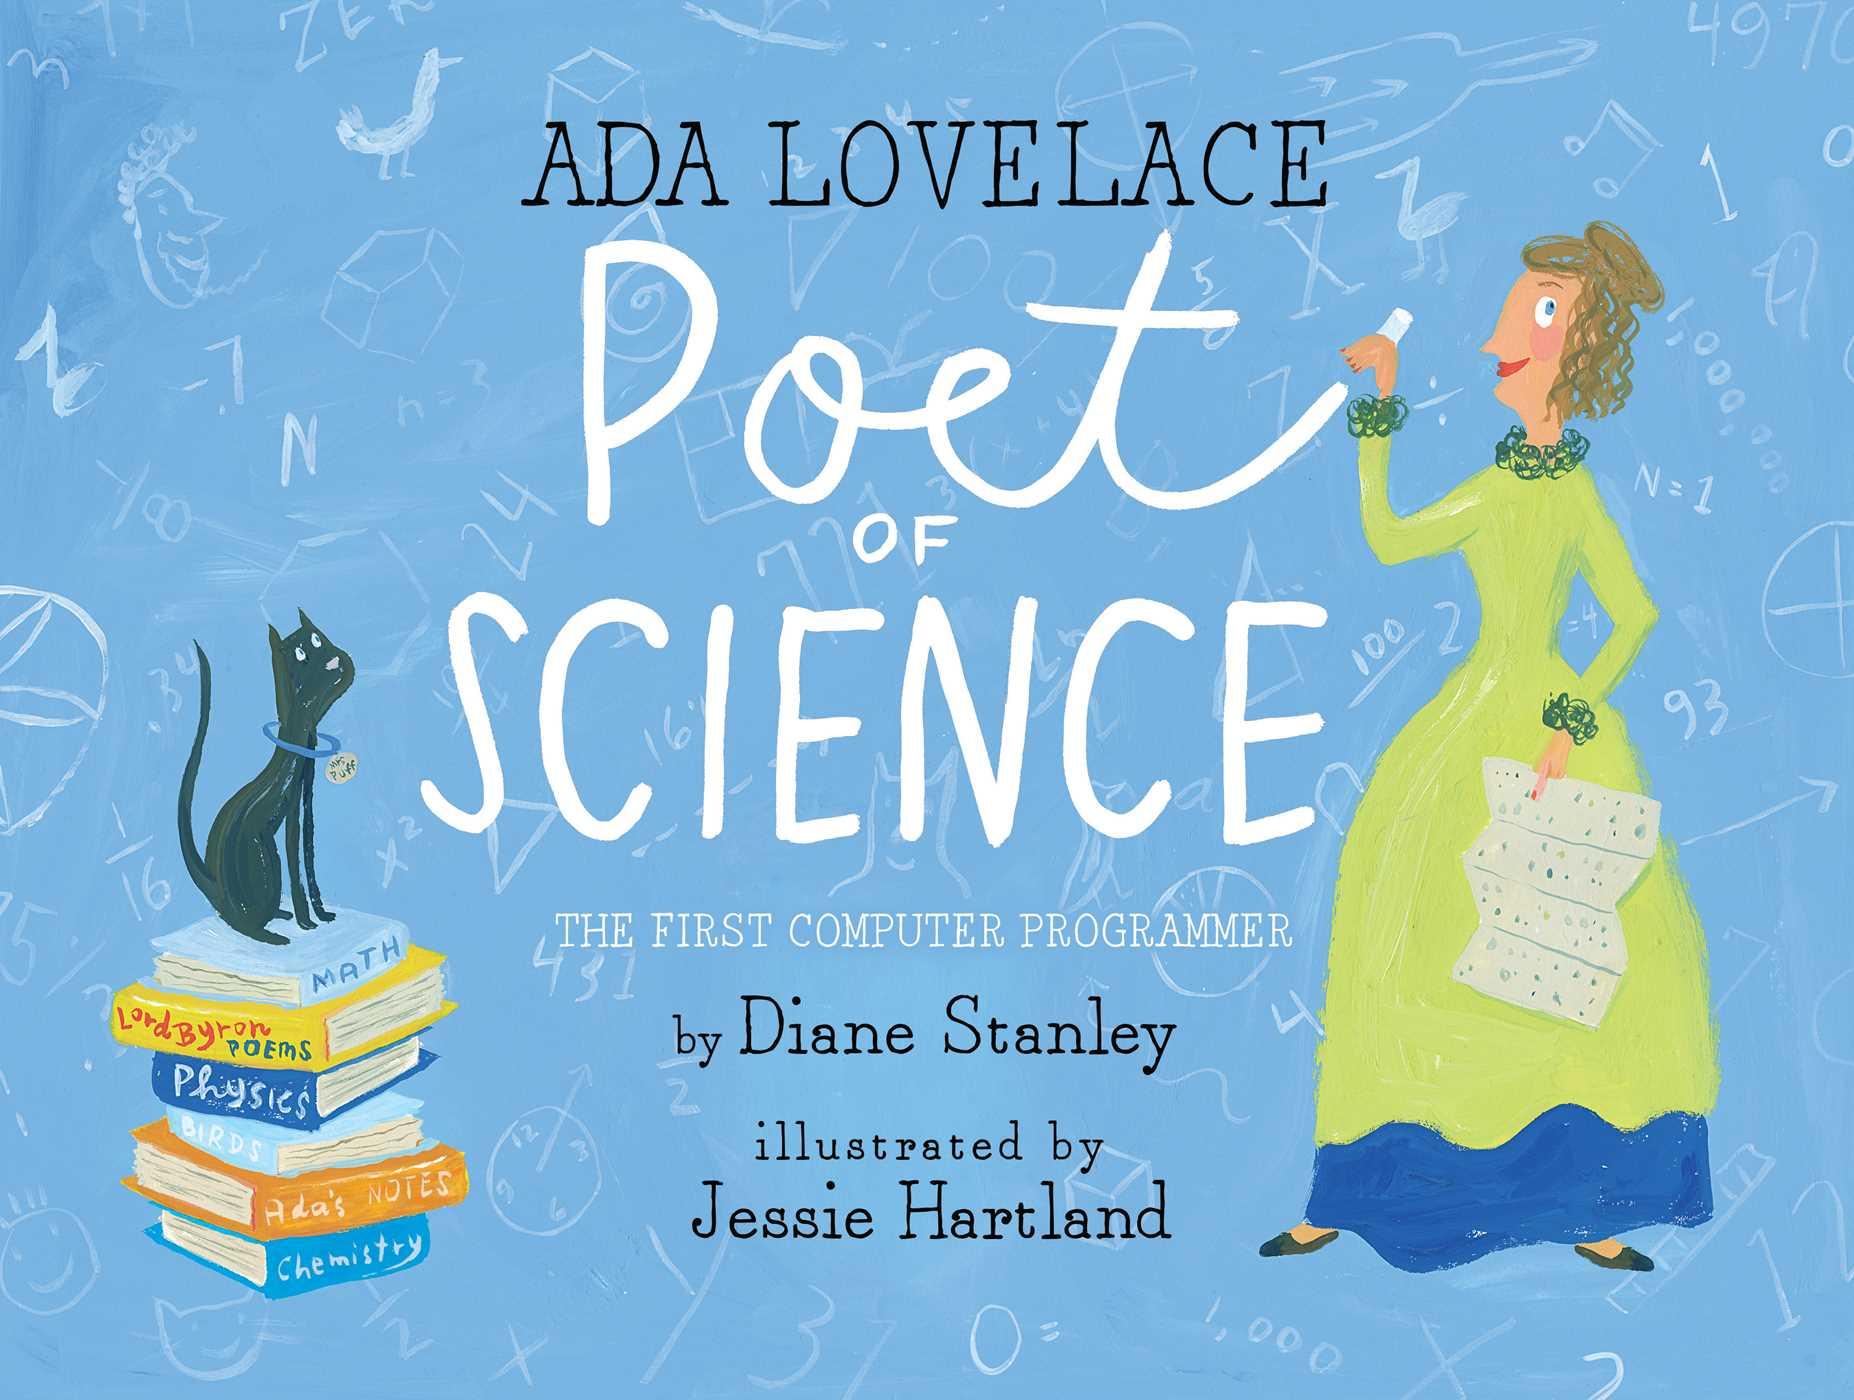 Ada lovelace poet of science 9781481452496 hr